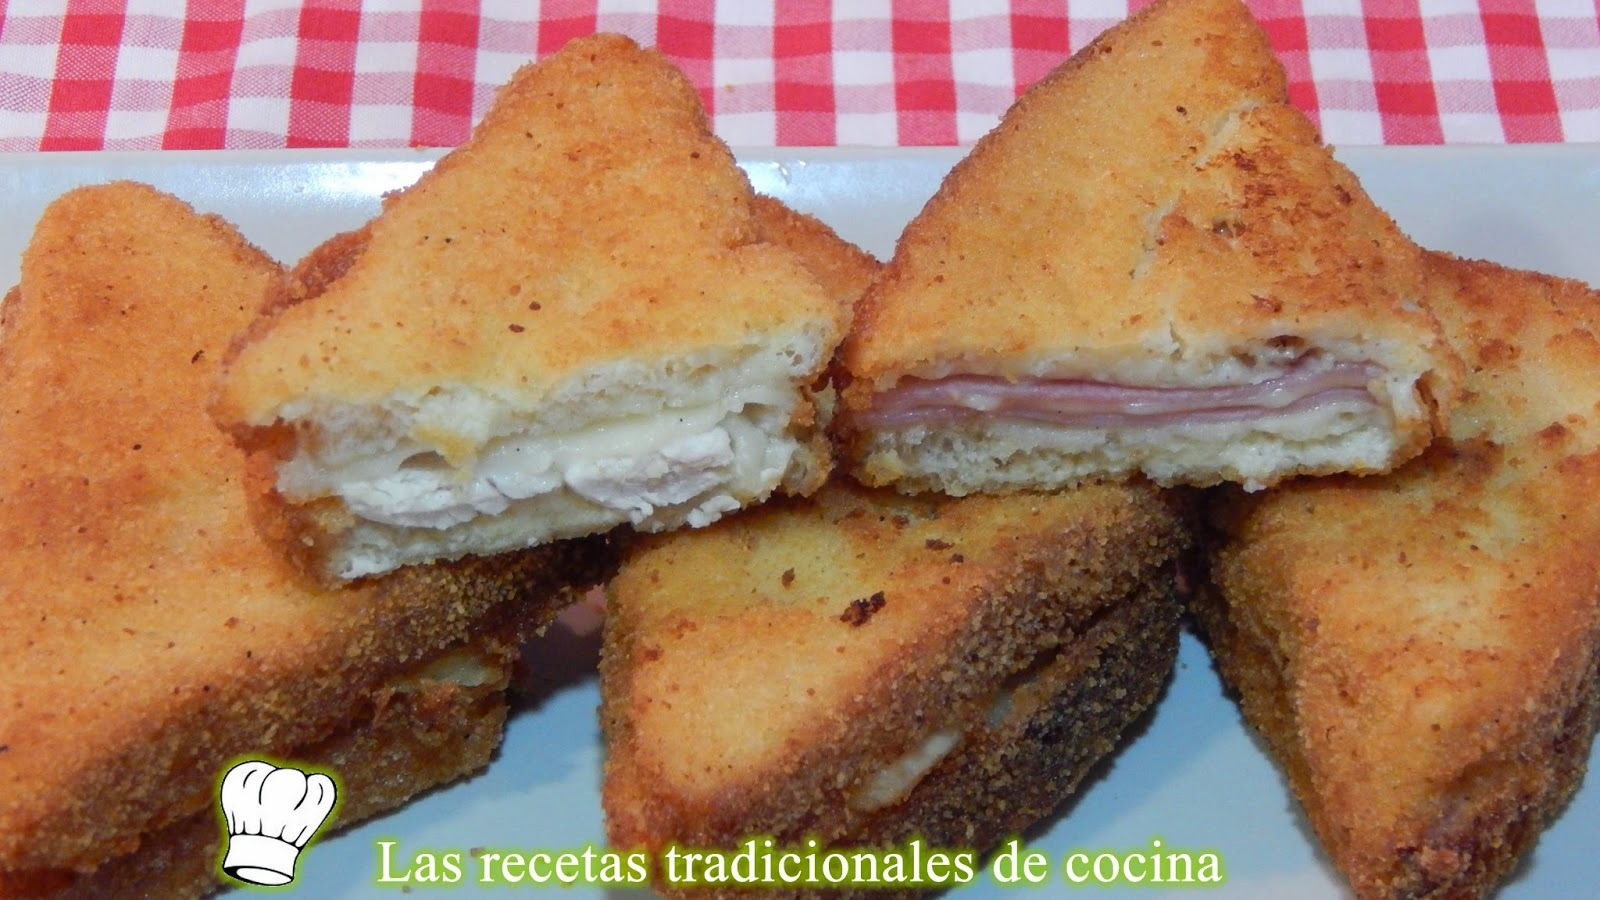 Croque monsieur o sandwich Monte cristo, receta